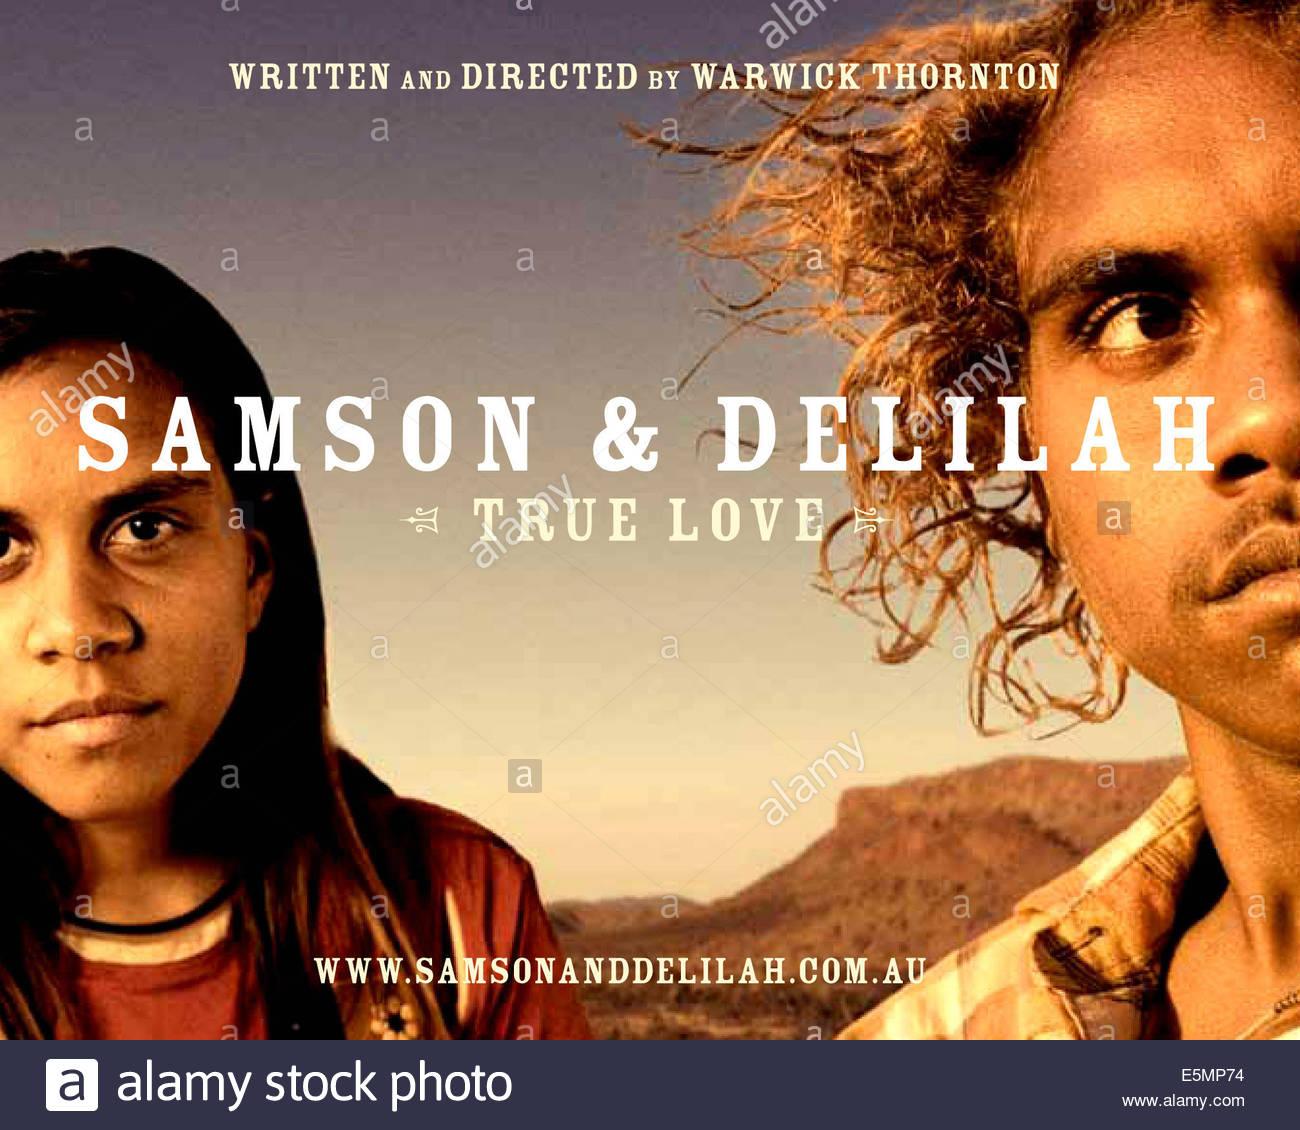 SAMSON Und DELILAH Aka Von Links Marissa Gibson Rowan McNamara 2009 C Fussabdruck Filme Courtesy Everett